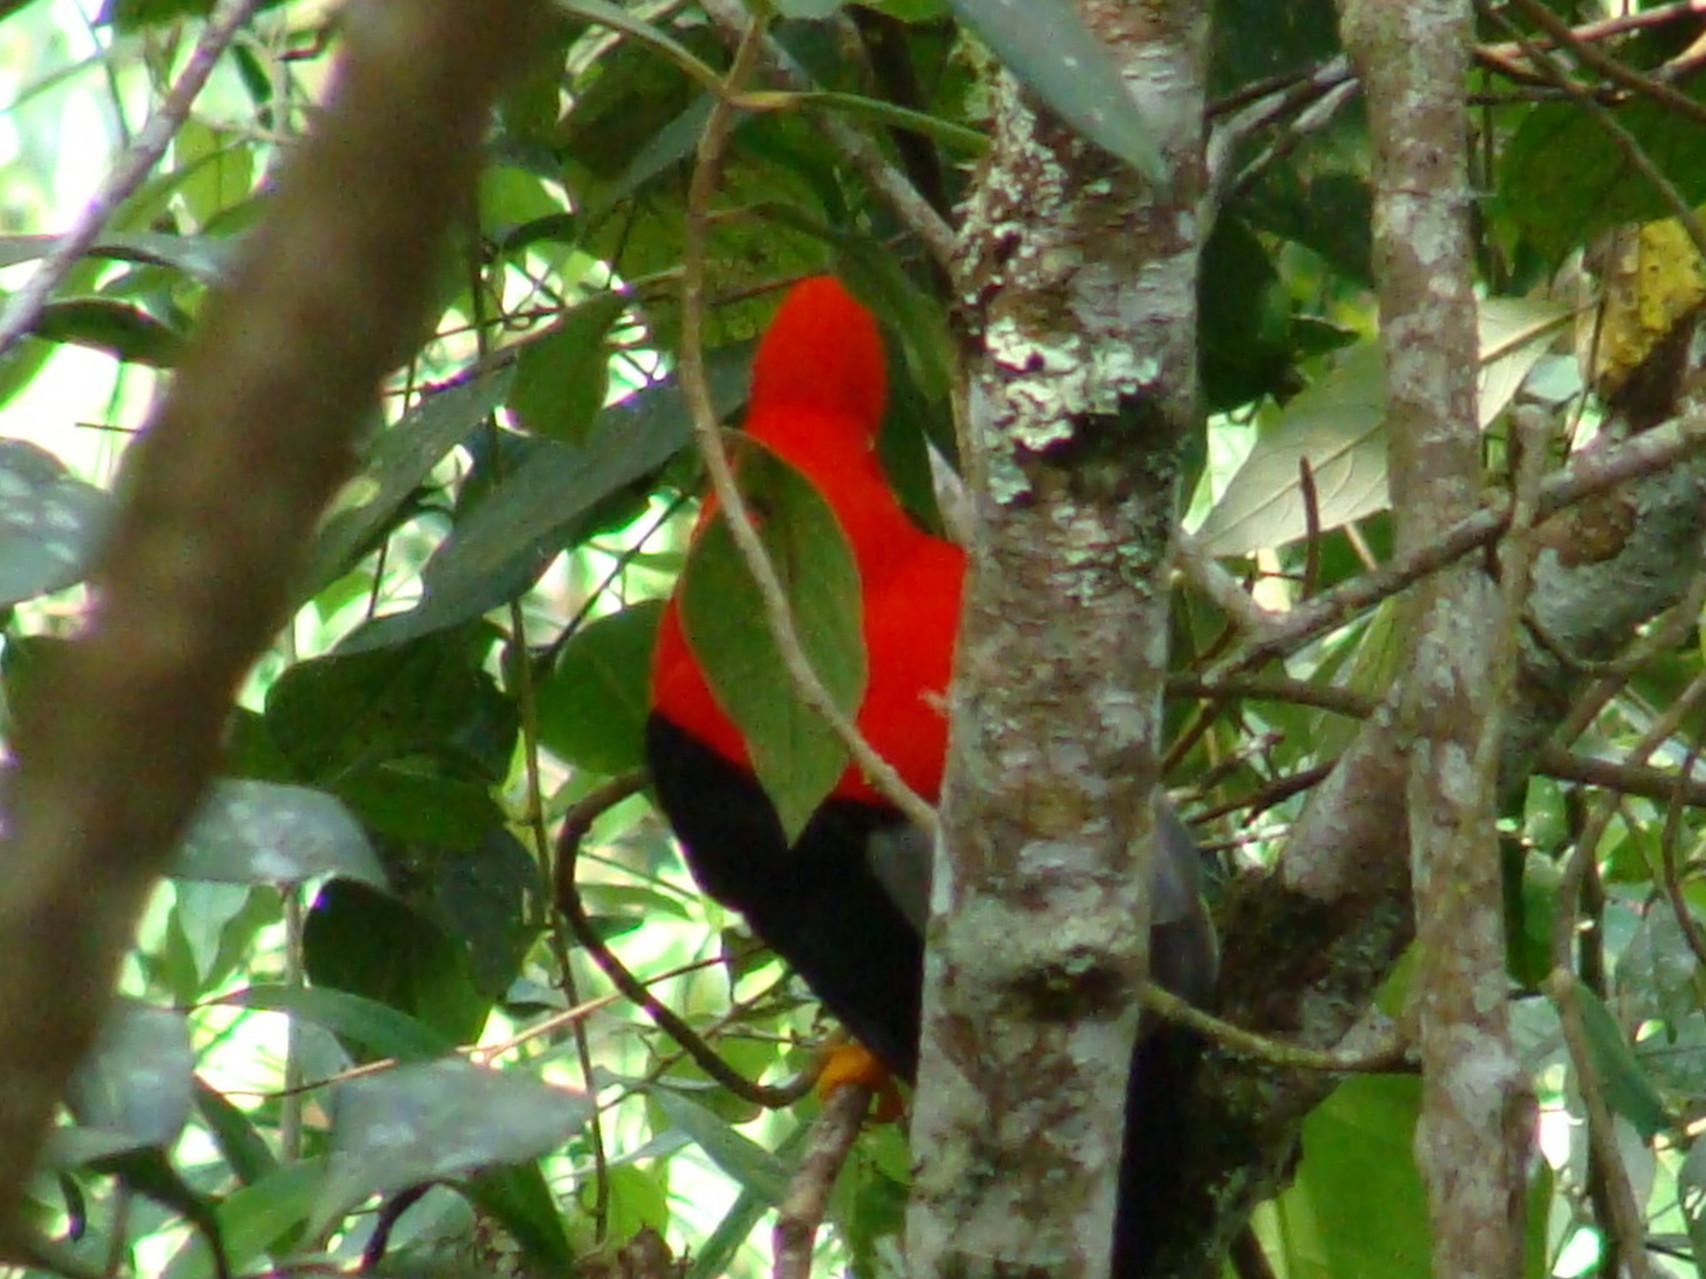 Rupicola Peruviana